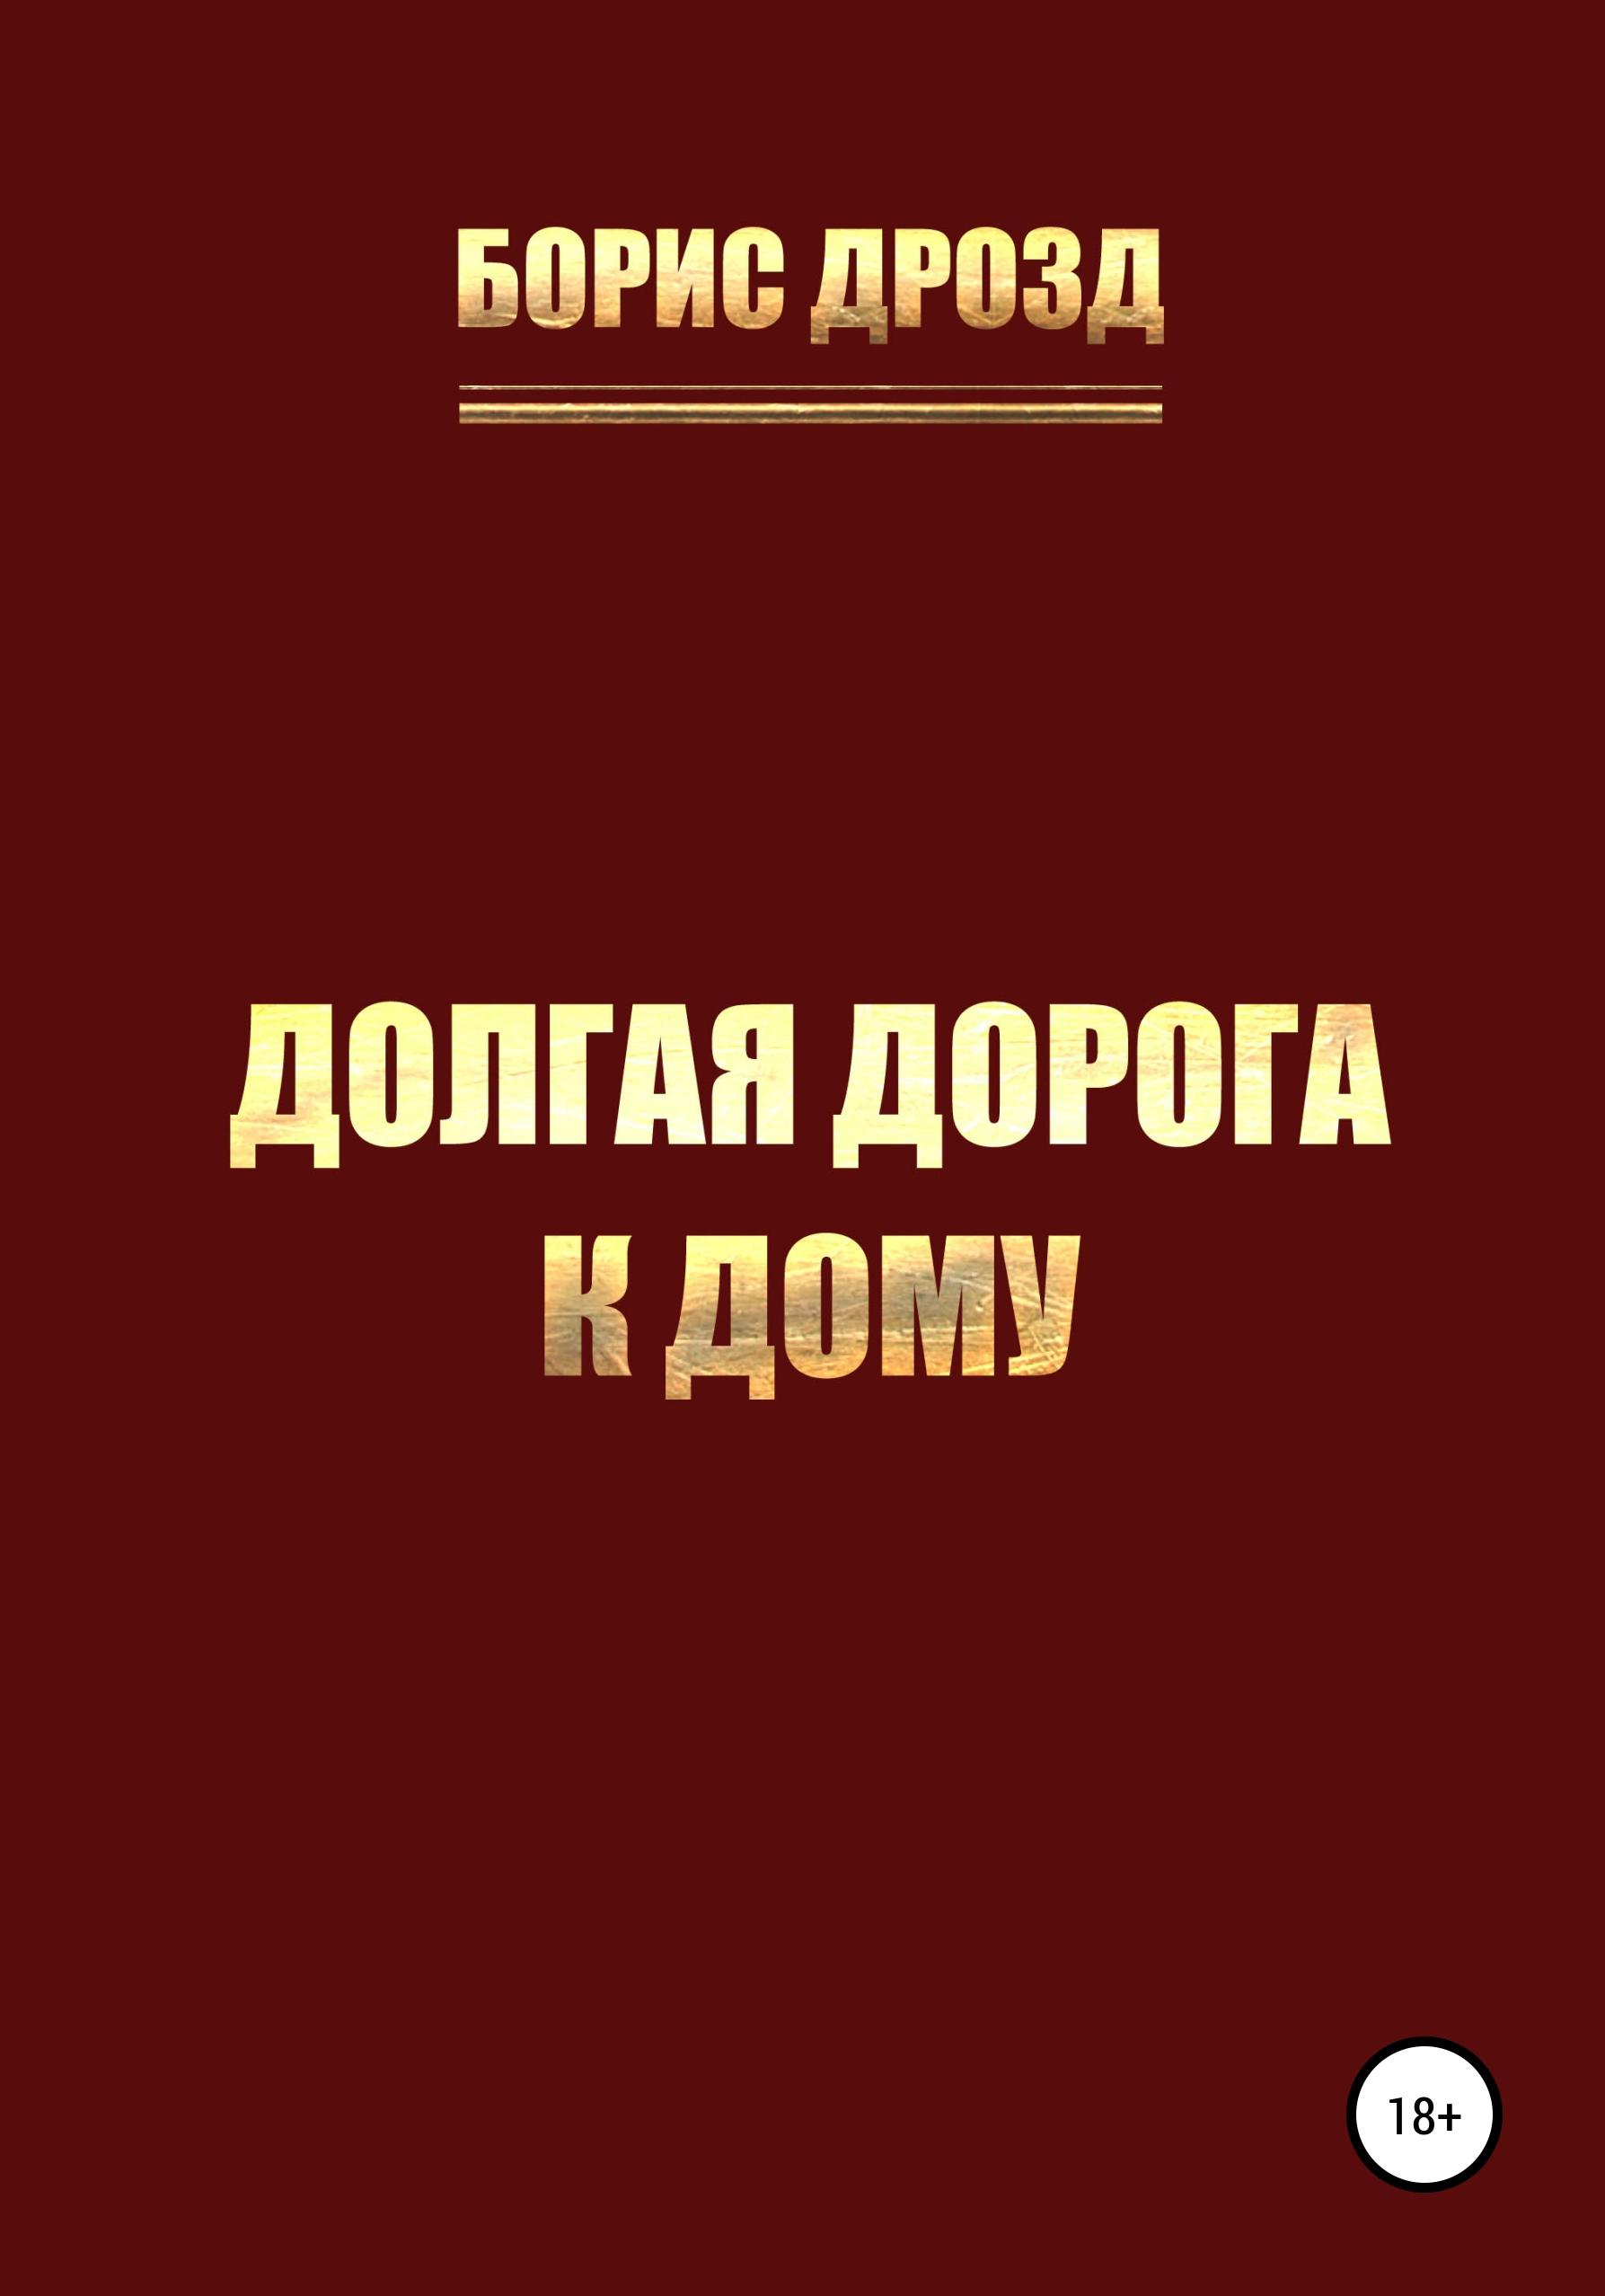 Борис Дмитриеич Дрозд Непобежденный